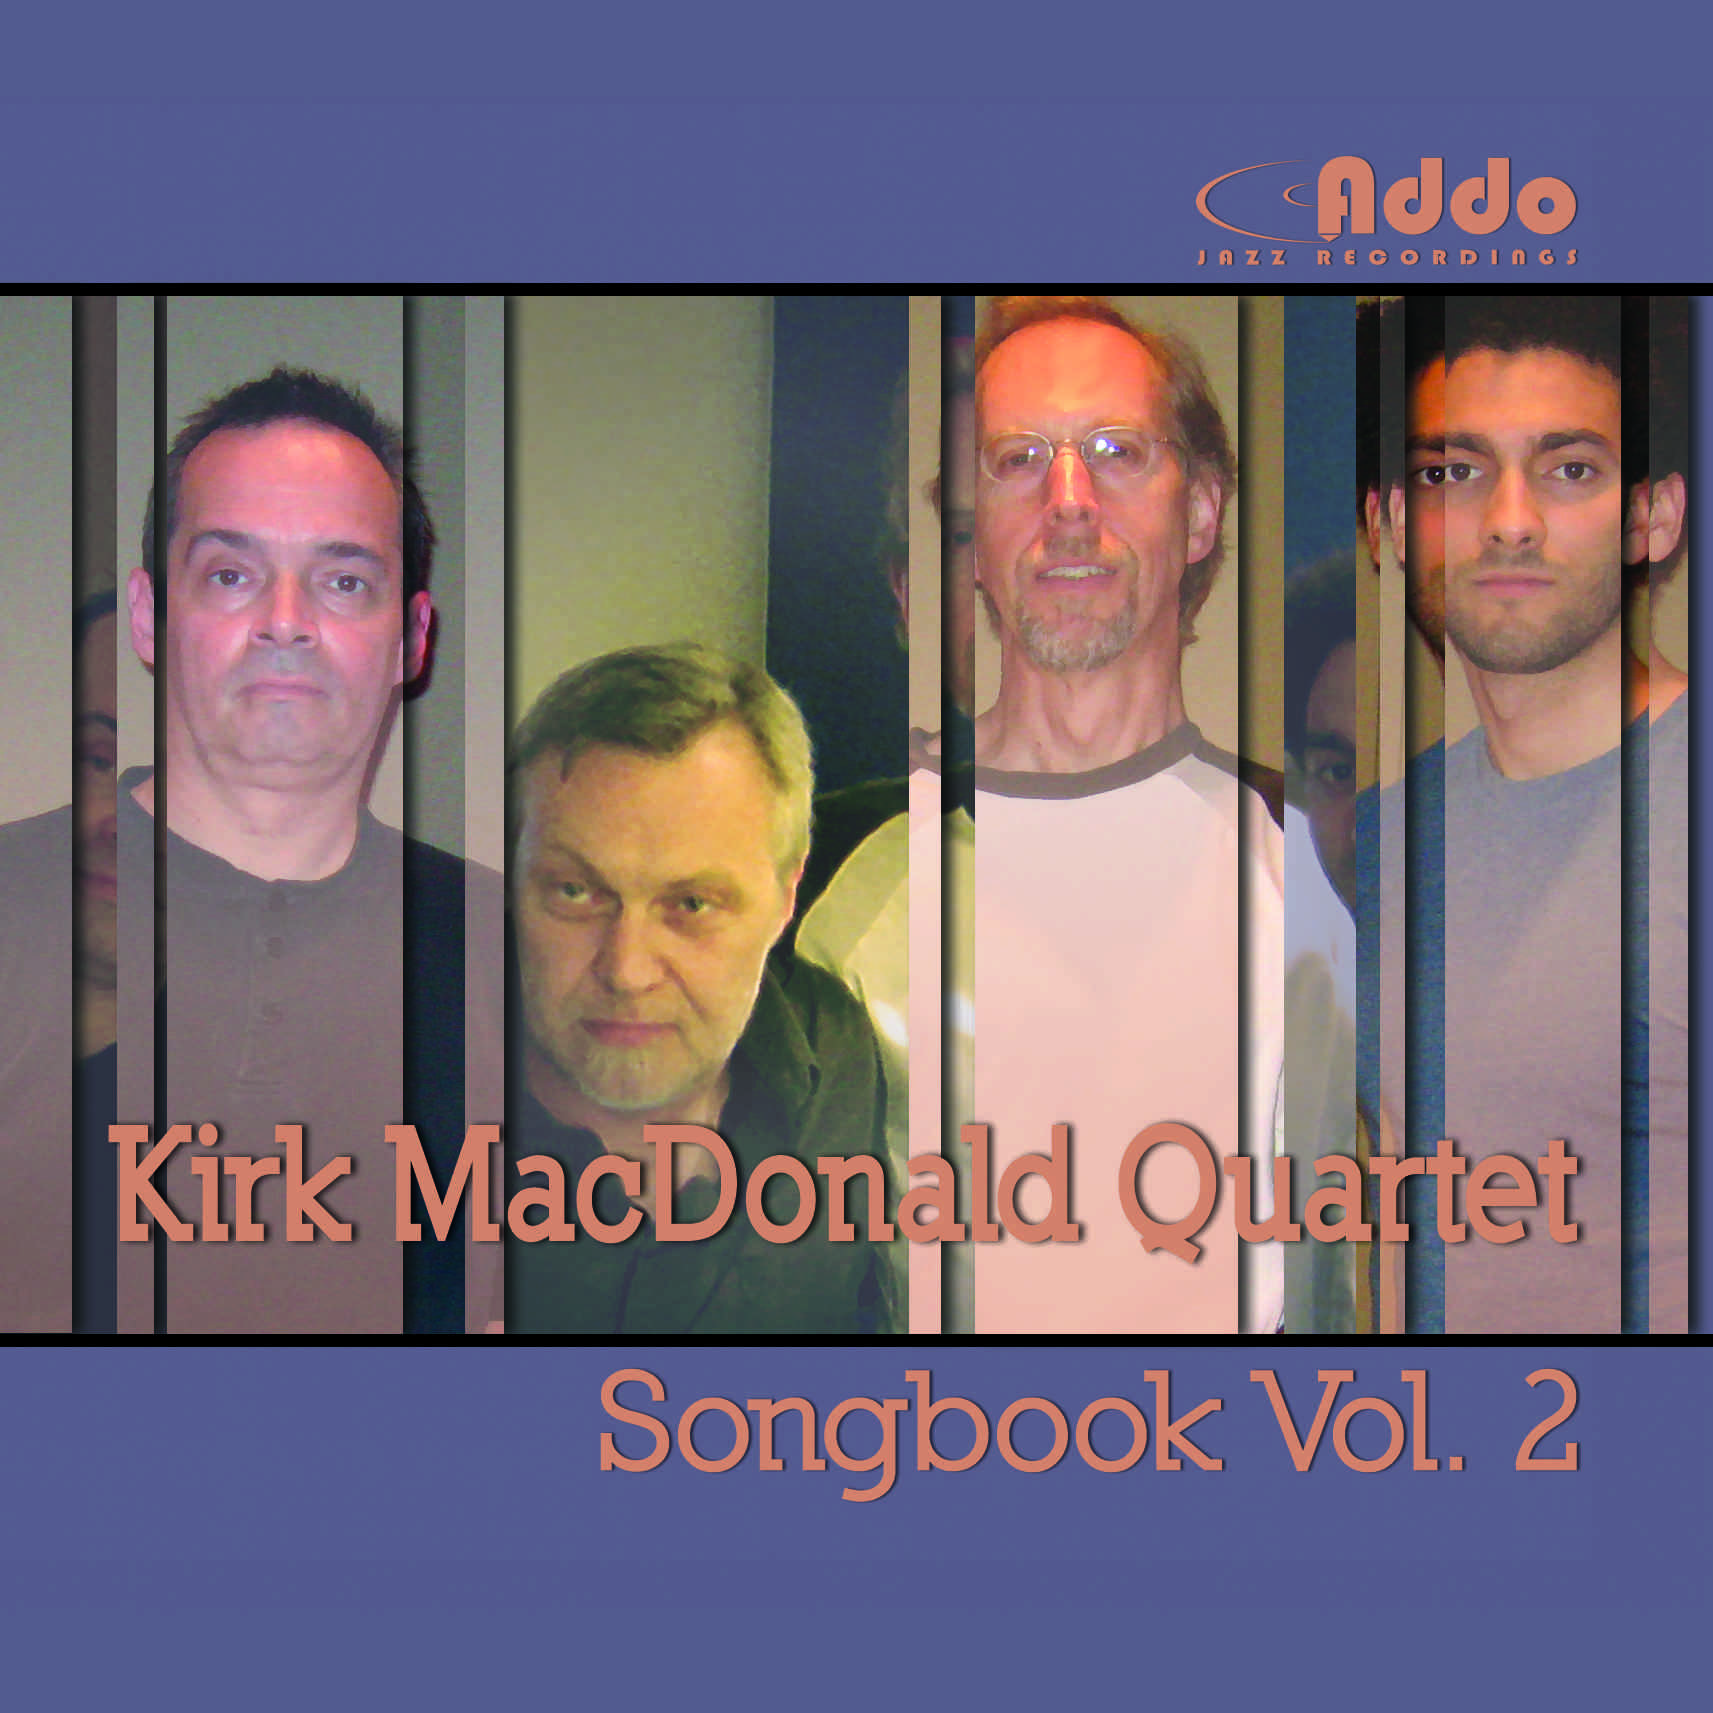 Kirk Macdonald - Songbook Vol. 2